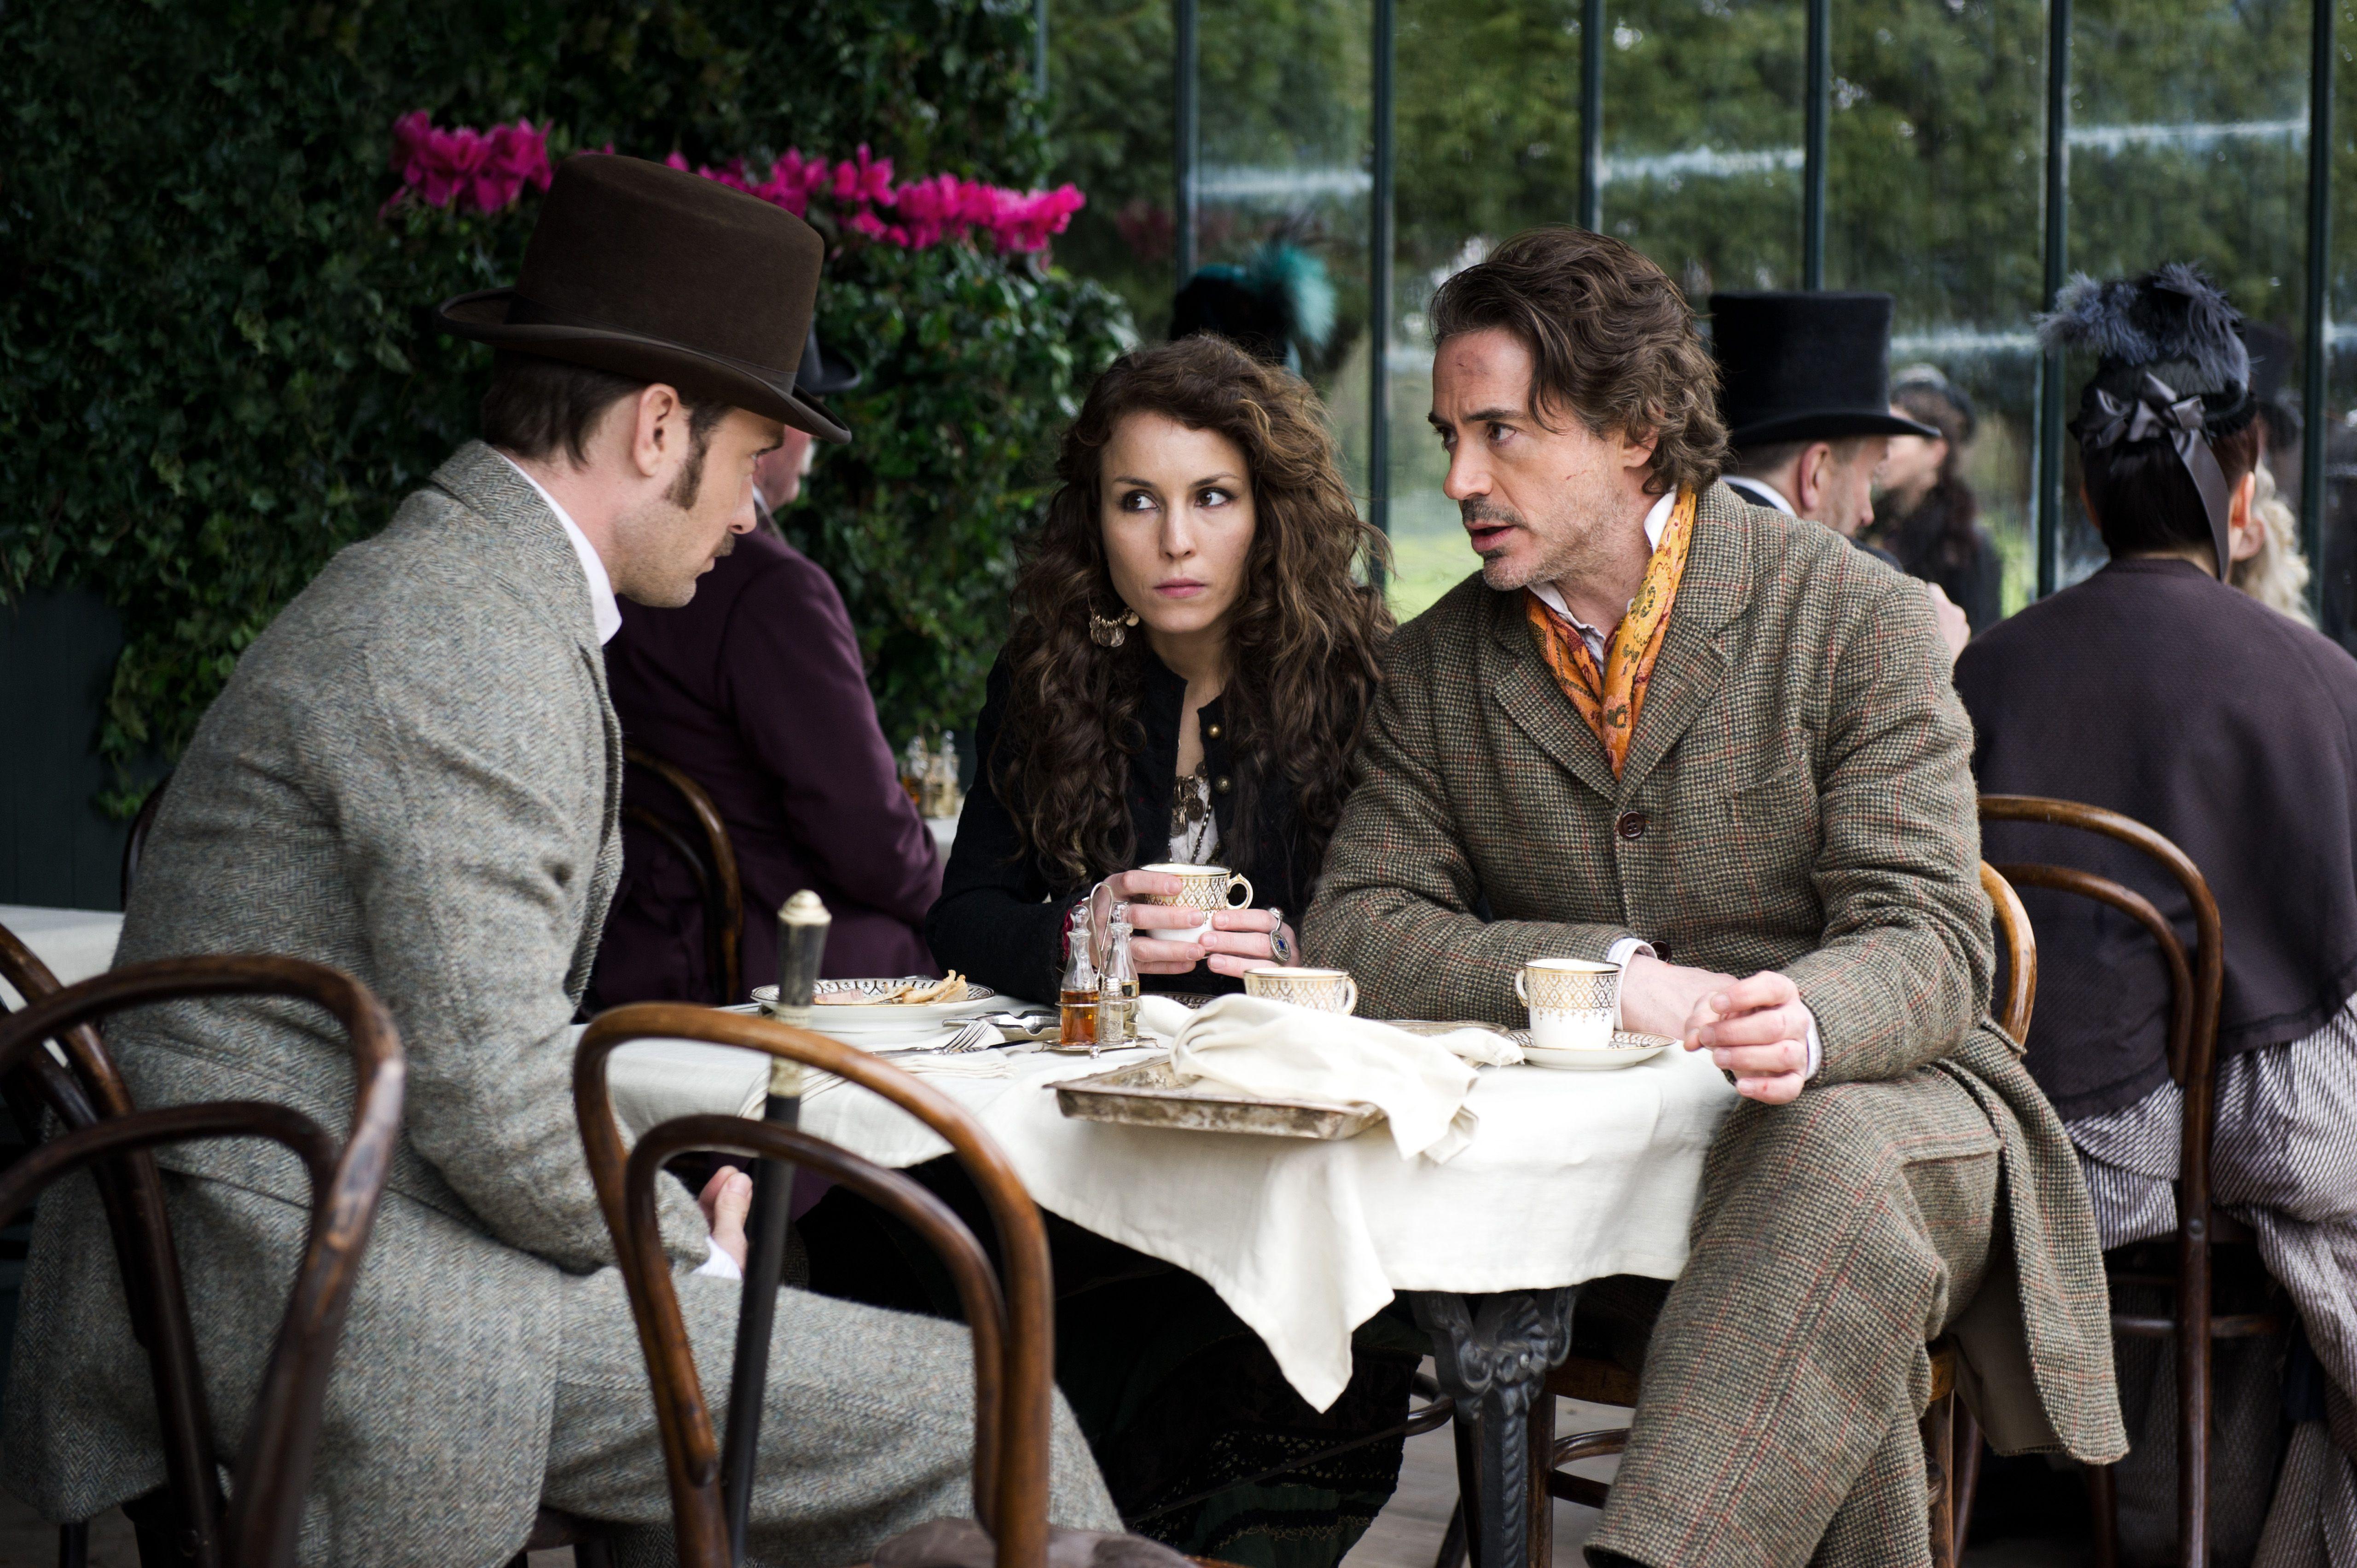 кадры из фильма Шерлок Холмс: Игра теней Джуд Лоу, Номи Рапас, Роберт Дауни-мл.,